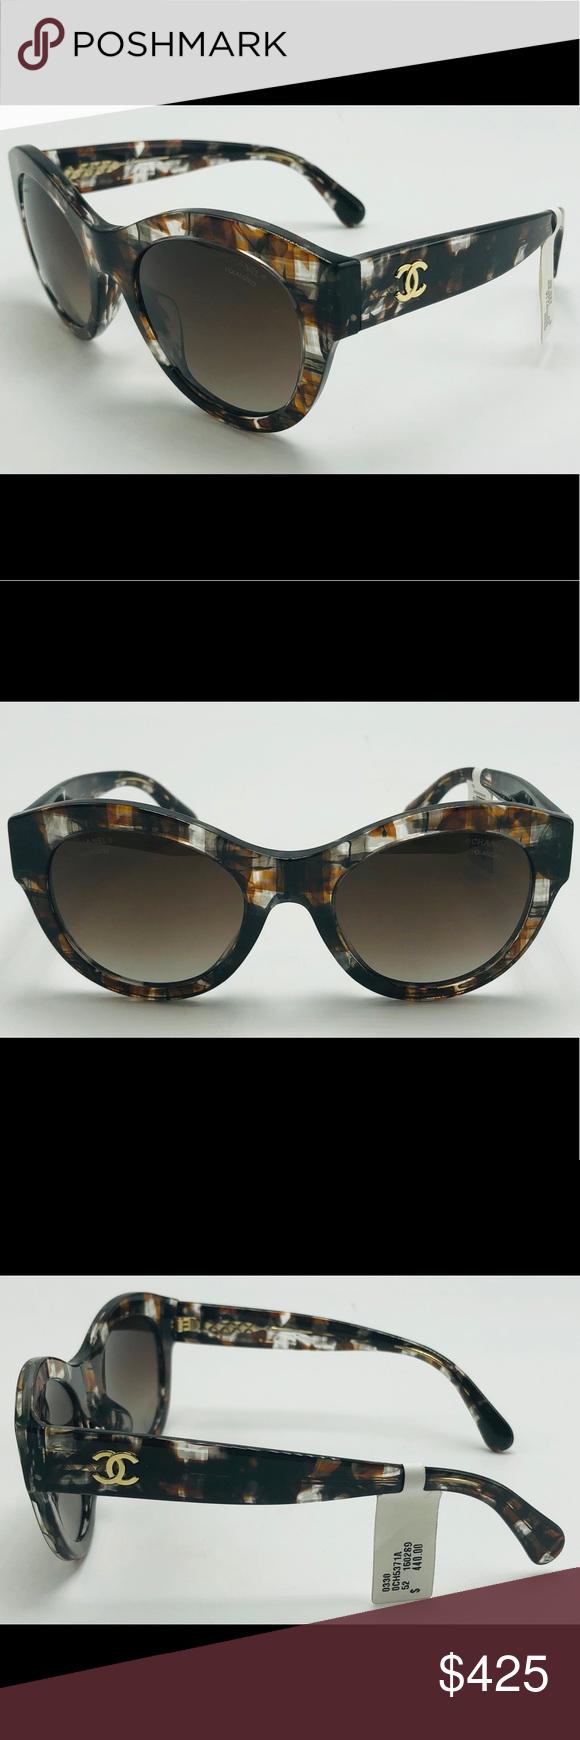 712df8bfa4 NWT Polarized Brown CHANEL Sunglasses 5371-A New Polarized Chanel Sunglasses  Condition – New with